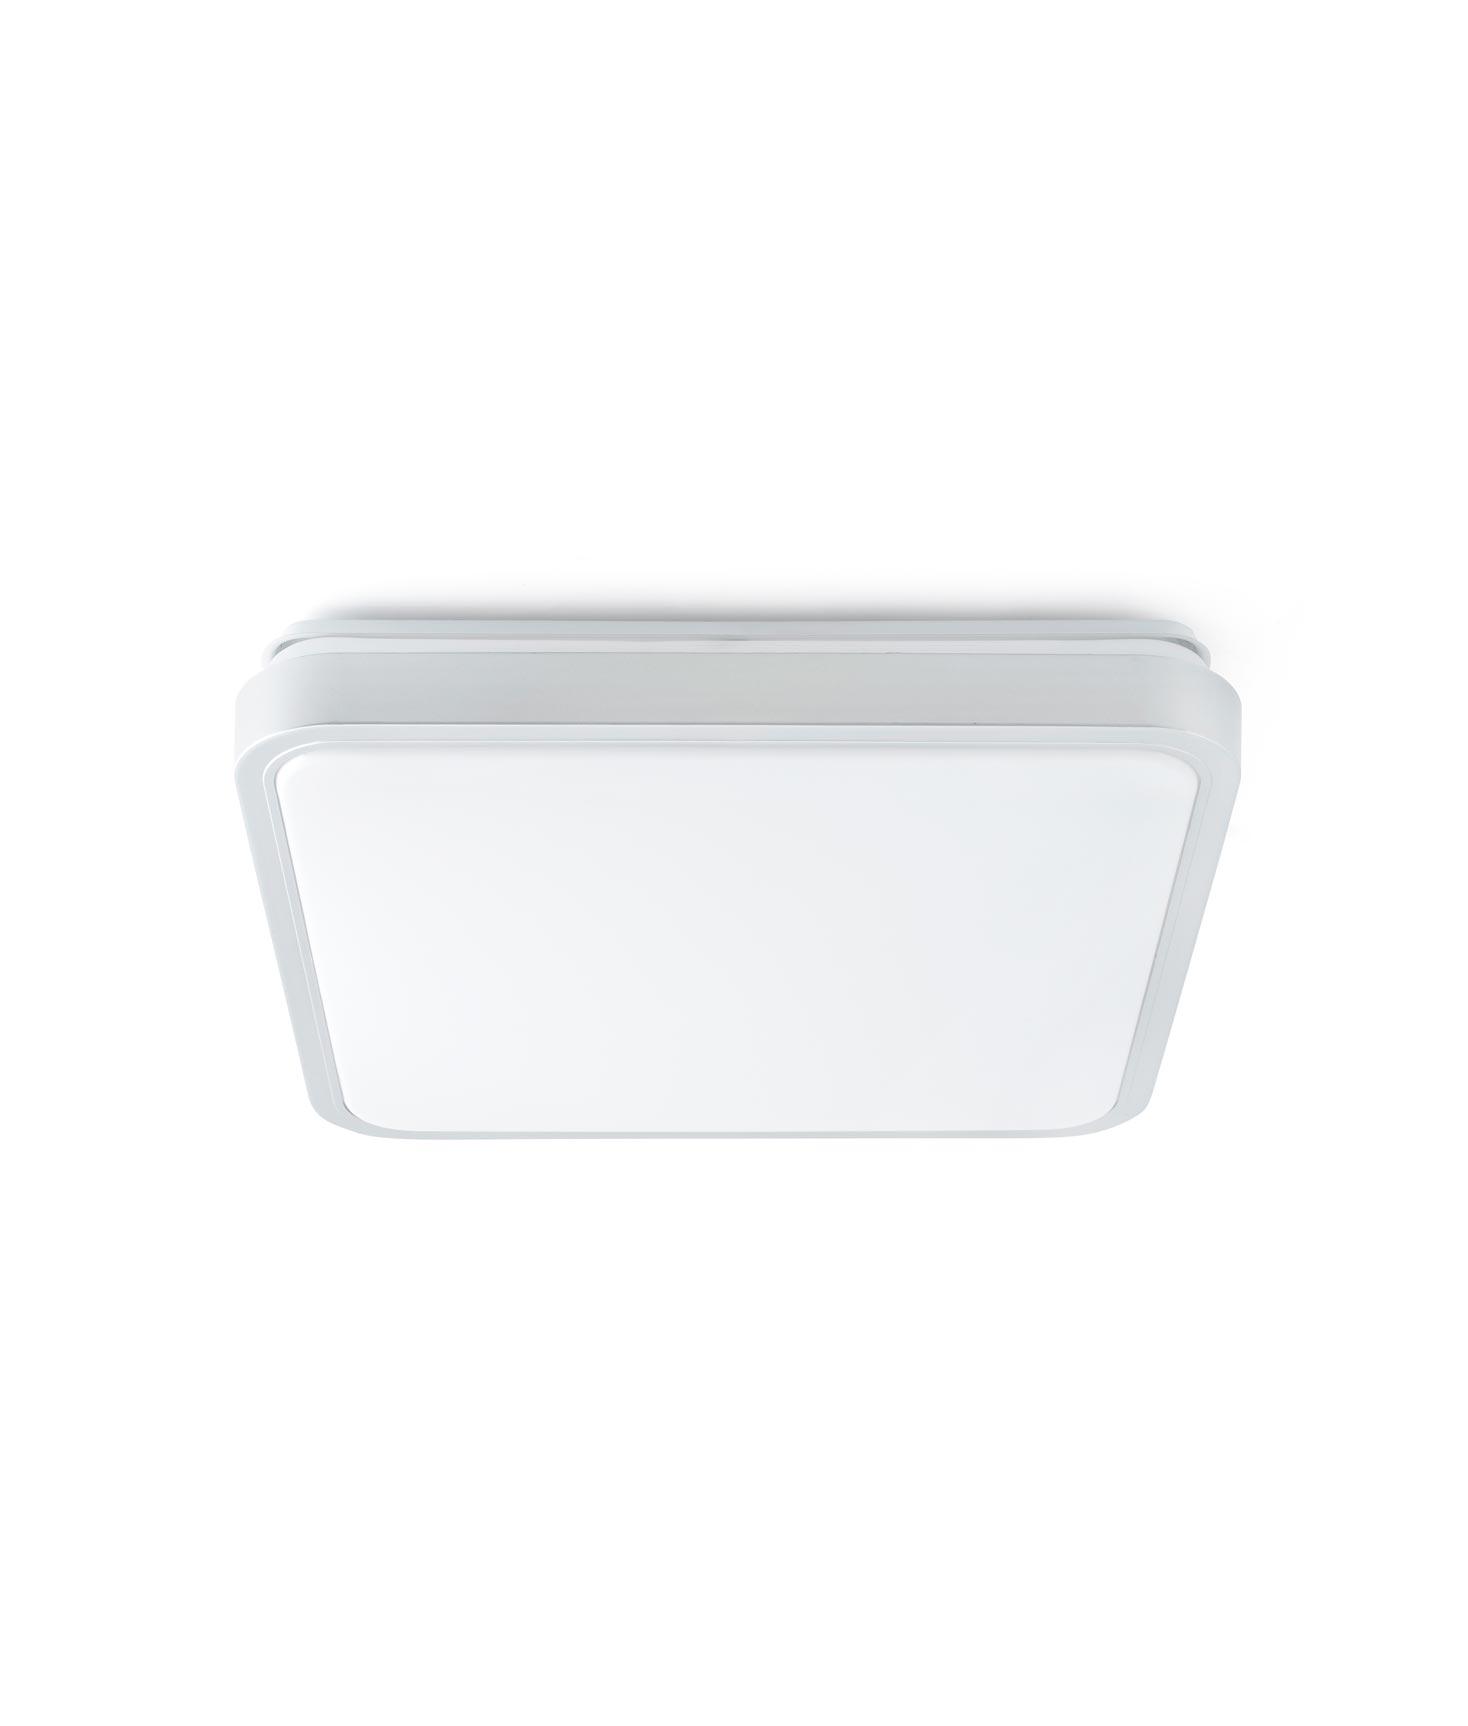 Plafón LED mediano IRIS gris